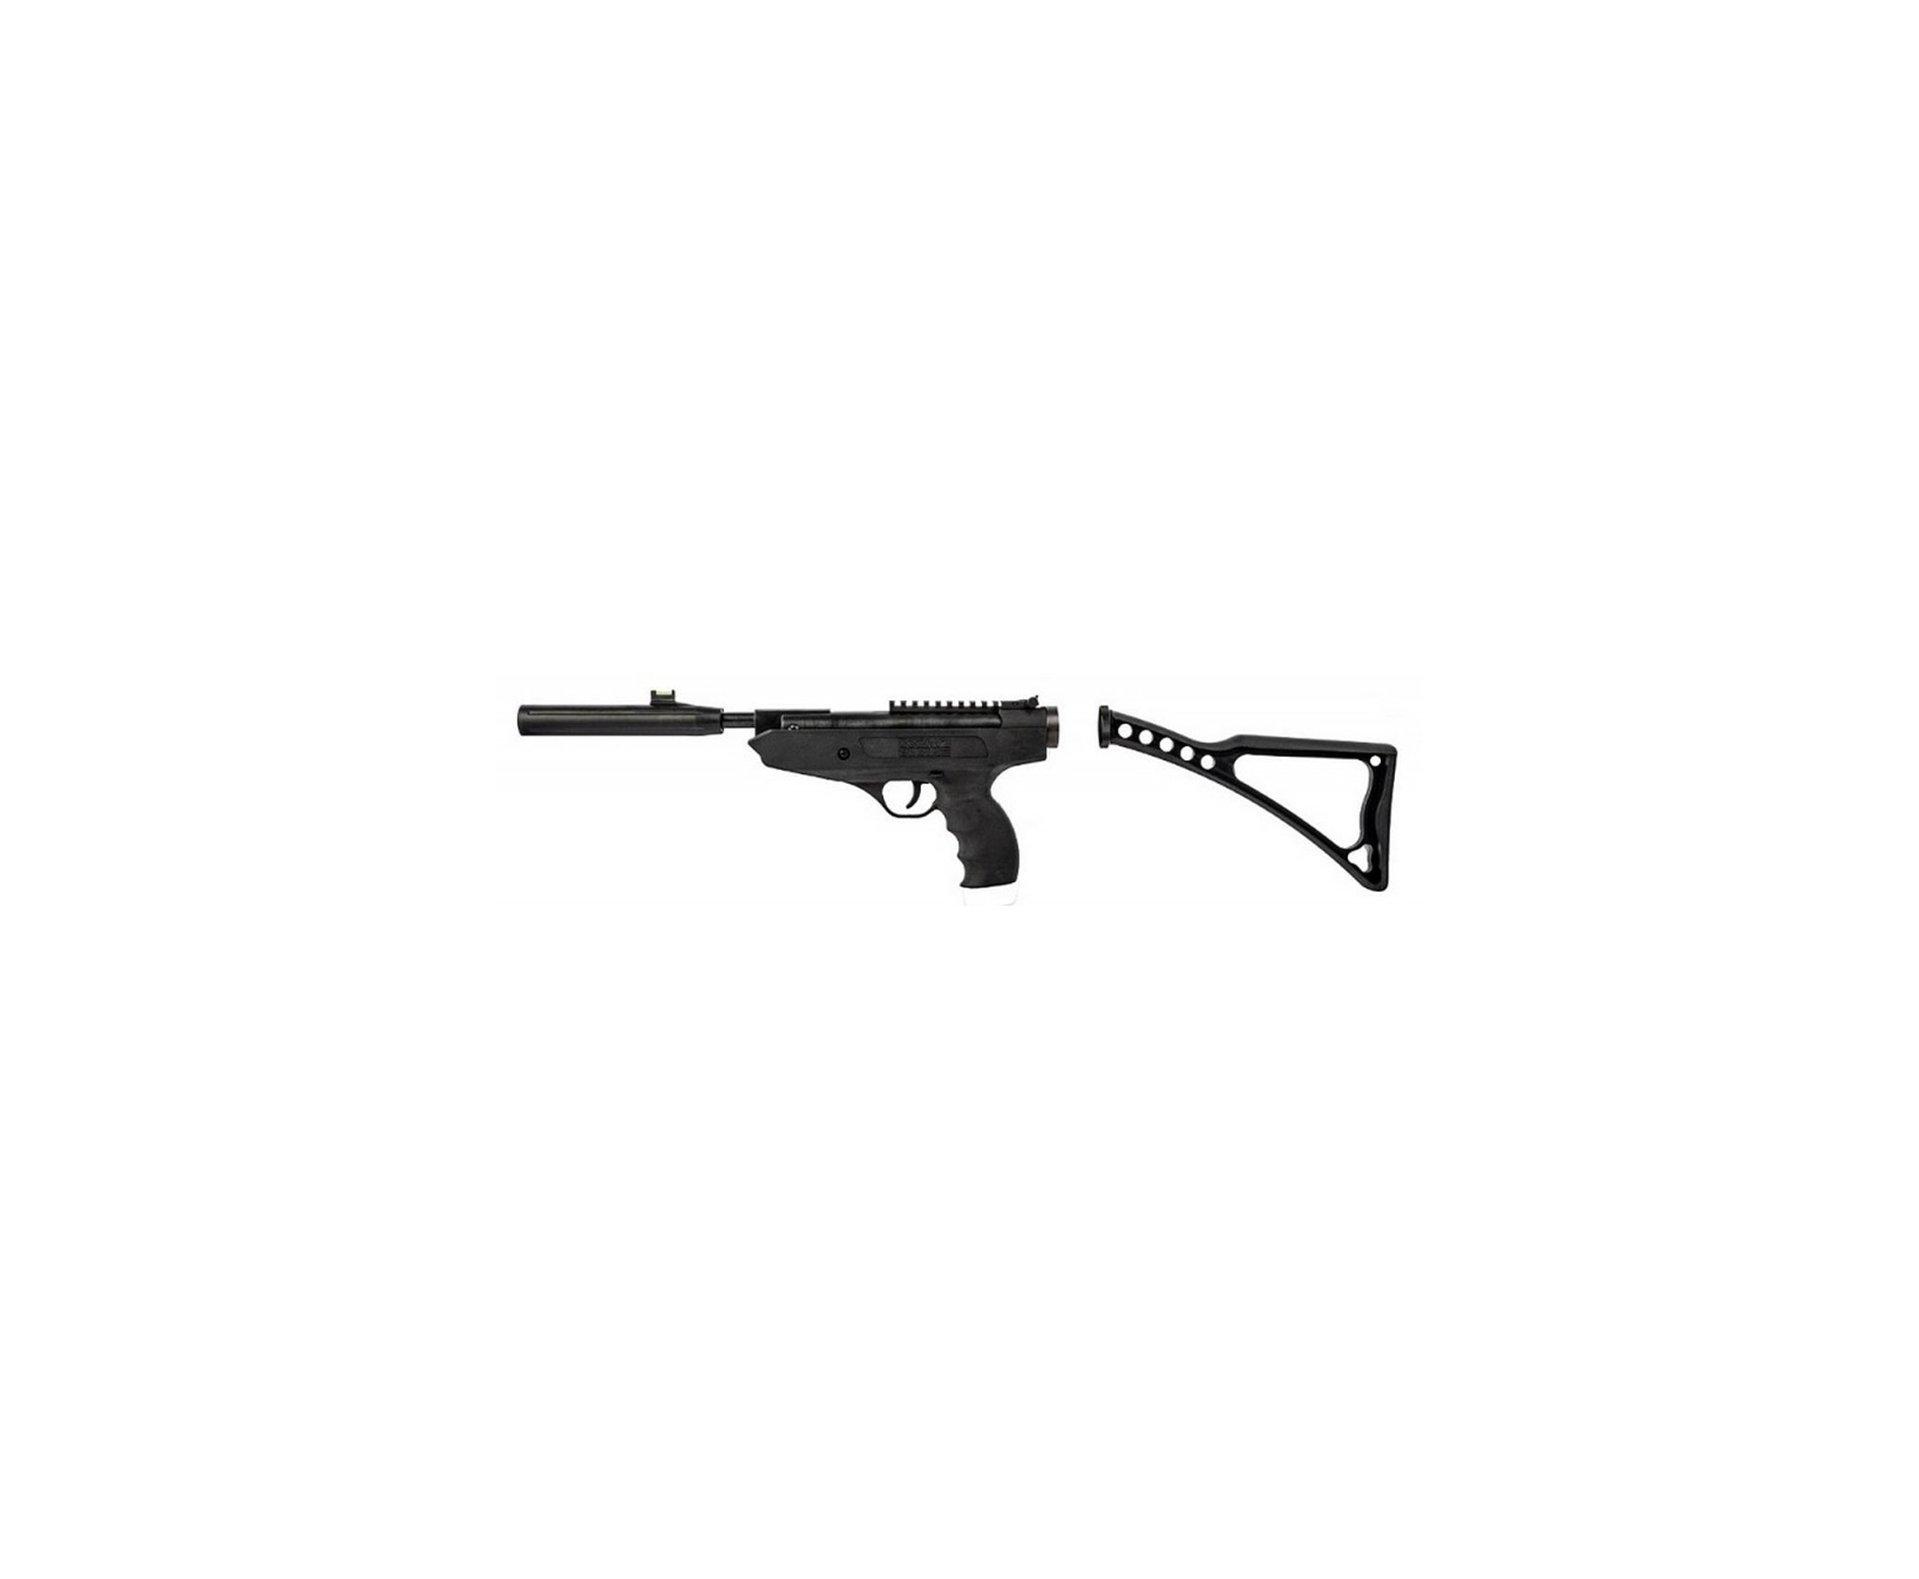 Pistola De Pressão Mod Fire 4,5mm Combo Pistola/carabina -  Swiss Arms